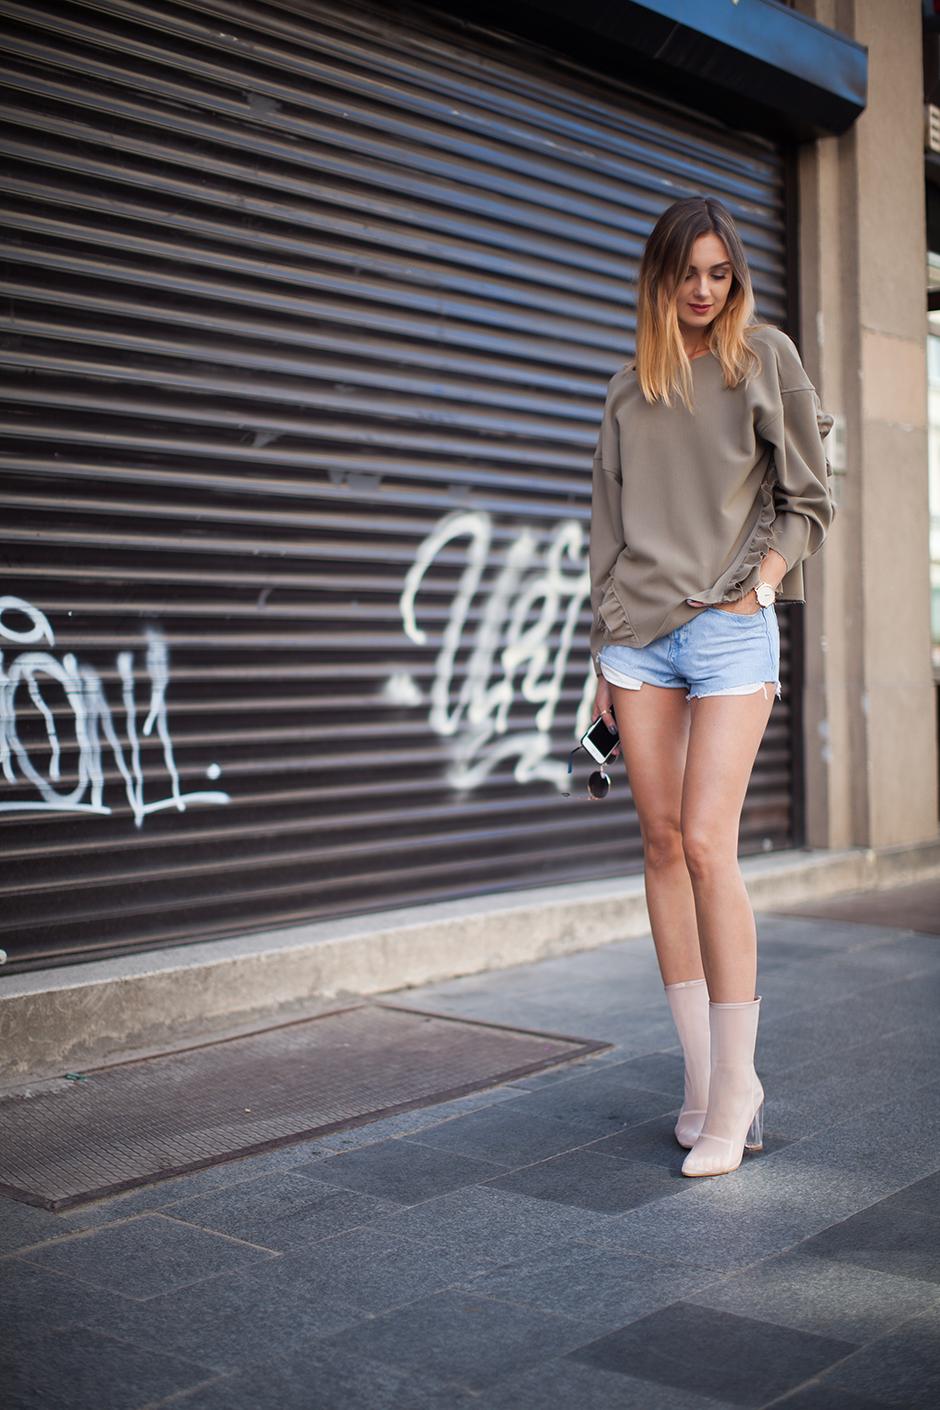 how-to-wear-denim-shorts-khaki-top-sweatshirt-mesh-boots-outfit